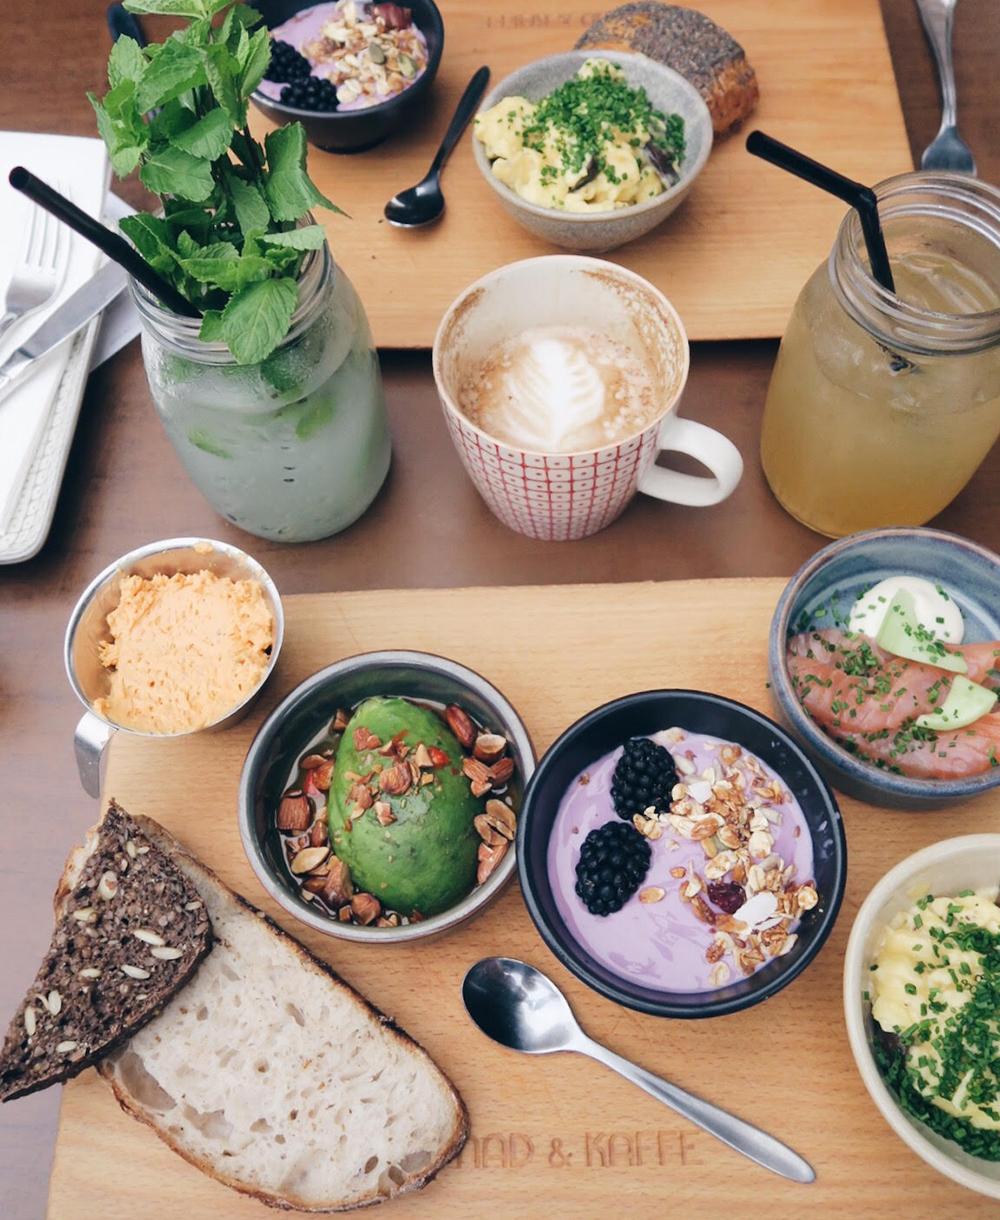 mad og kaffe.jpg